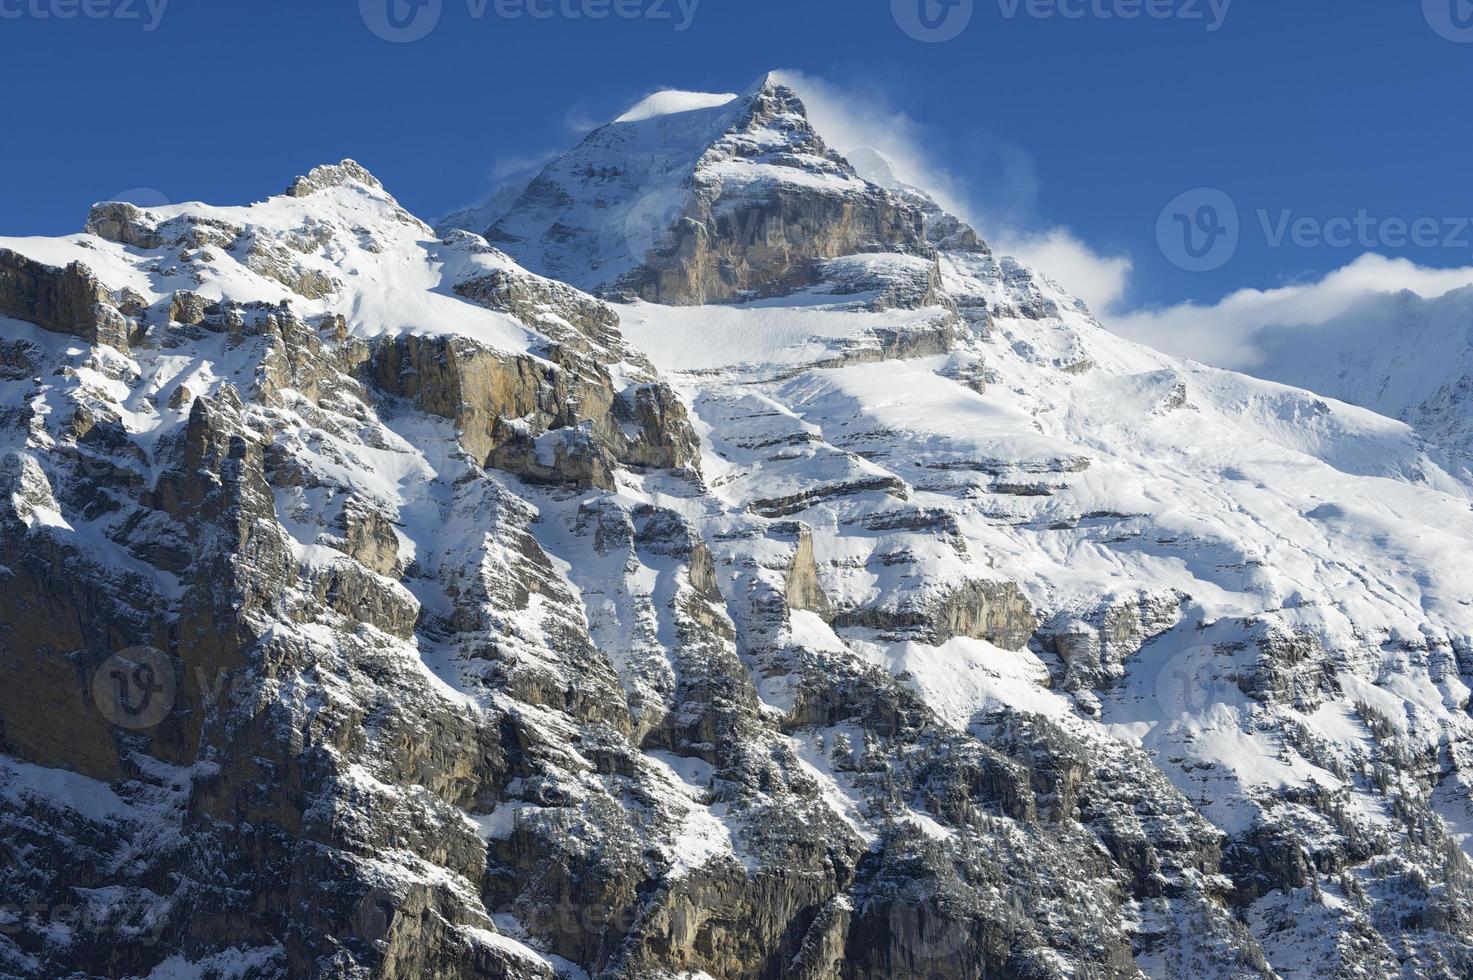 Winterbergblick in Berner Oberland, Schweiz. foto